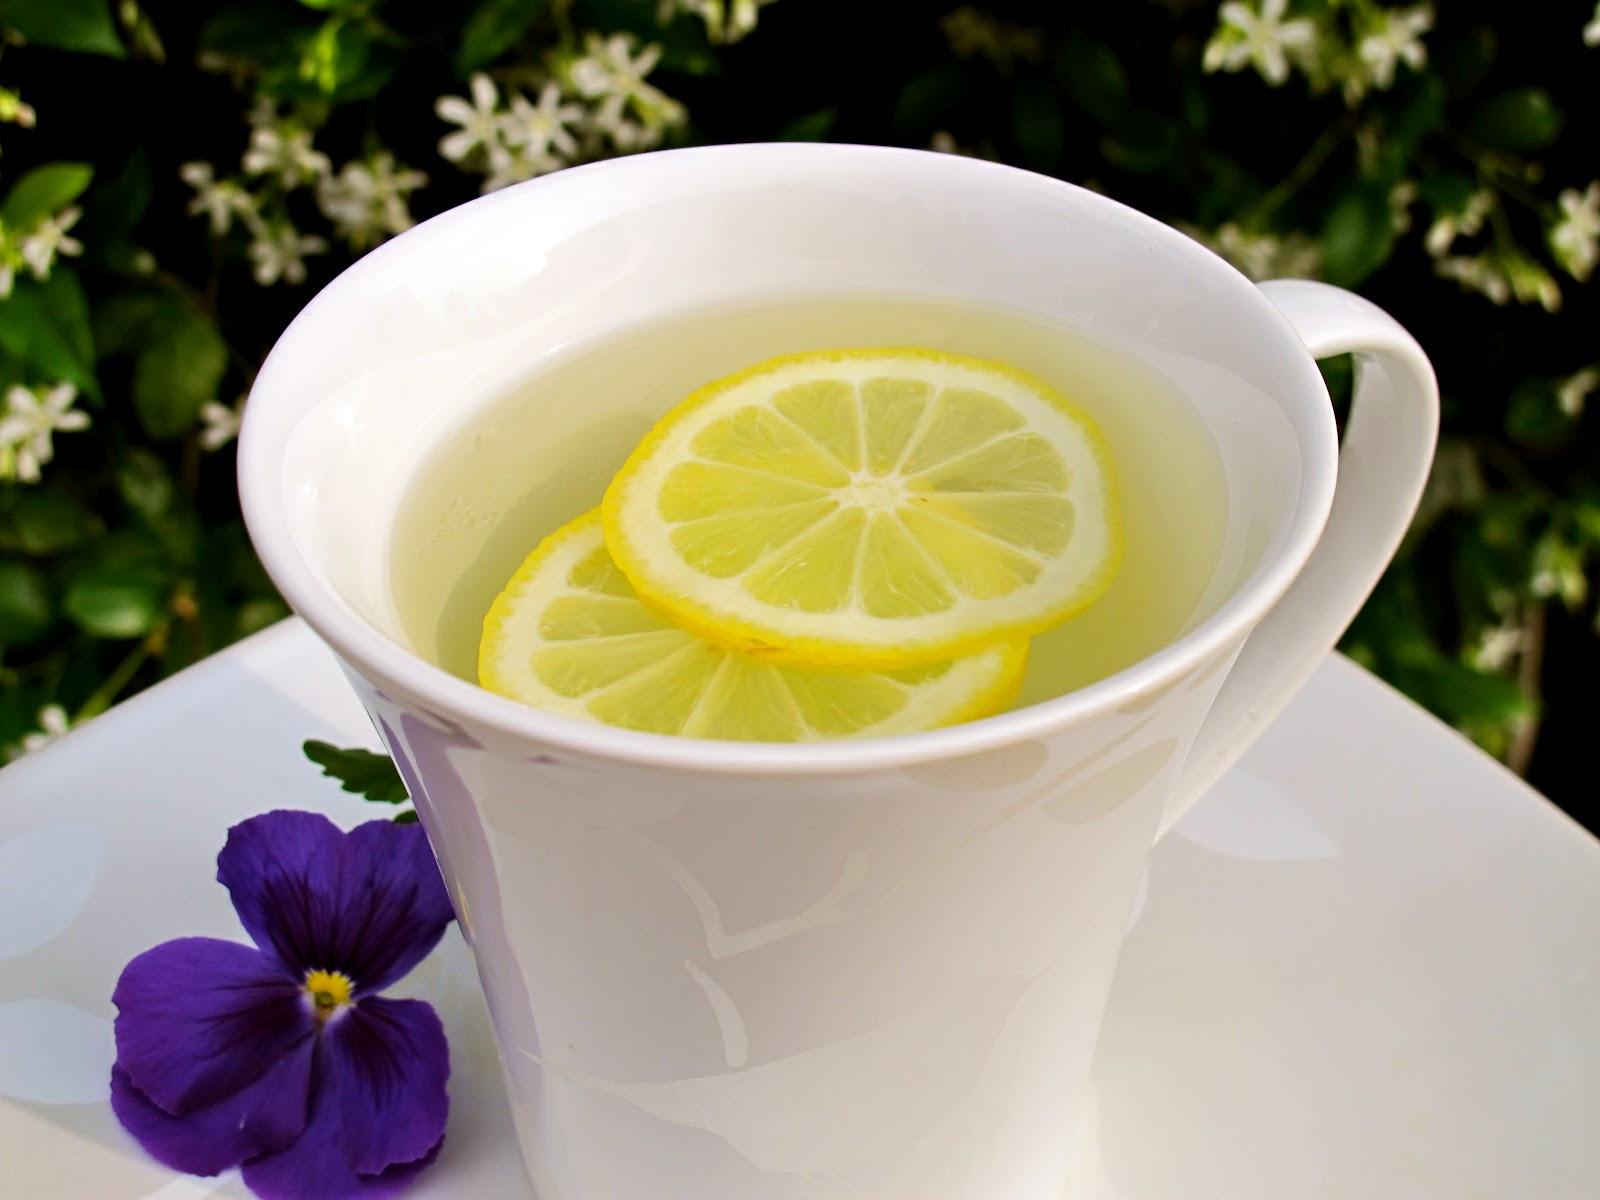 2-hot-water-and-lemon